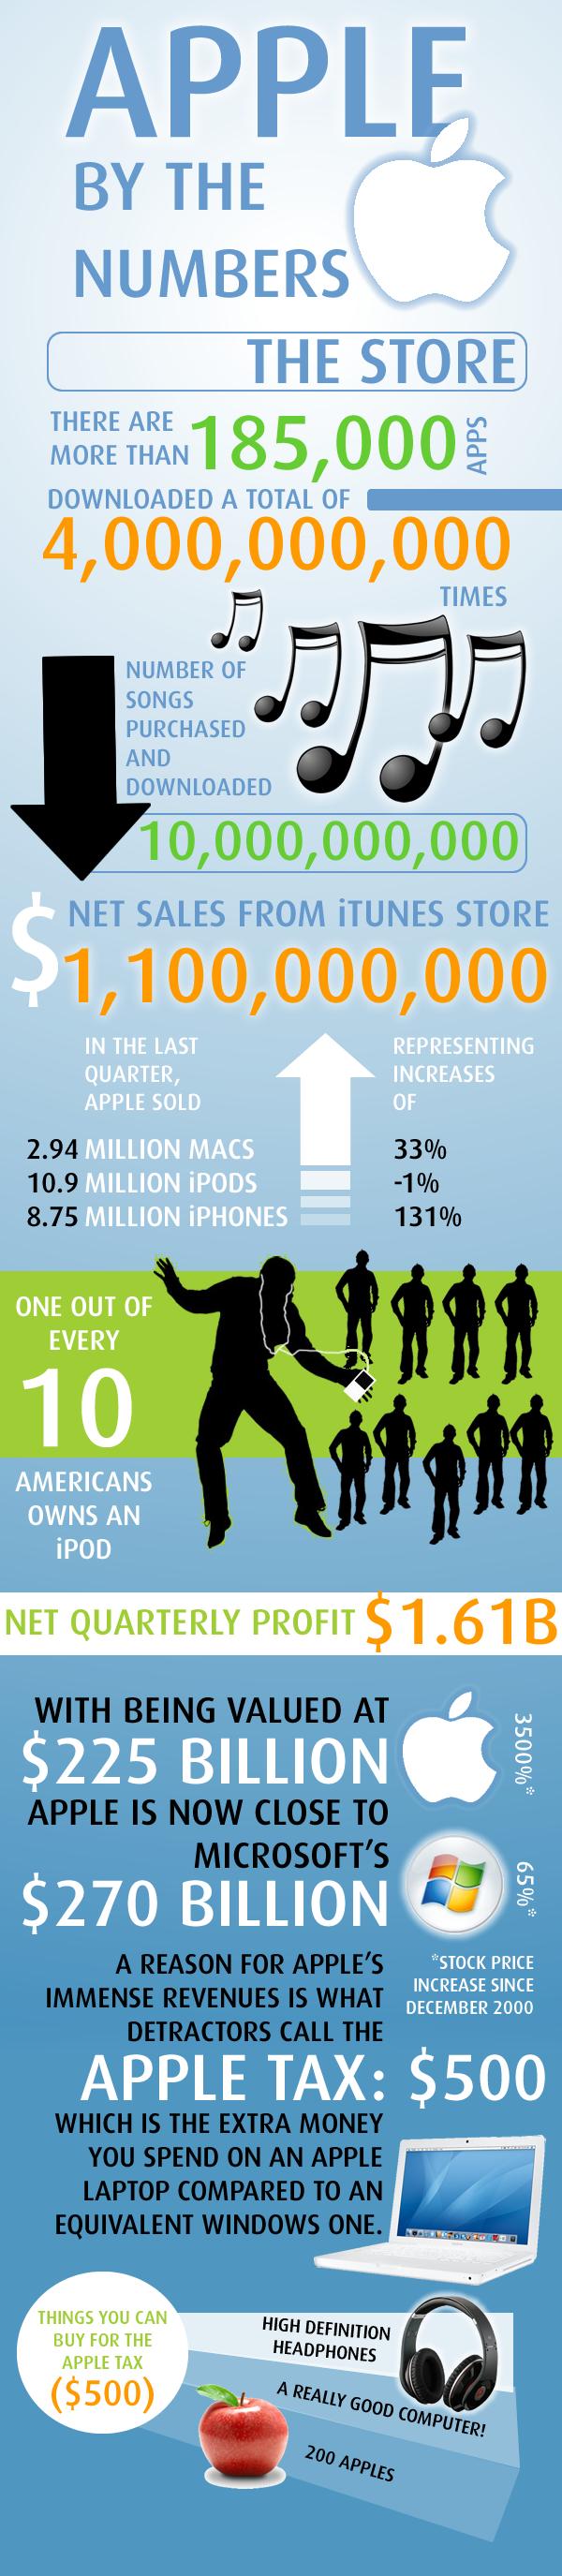 Apple Infographic.jpg